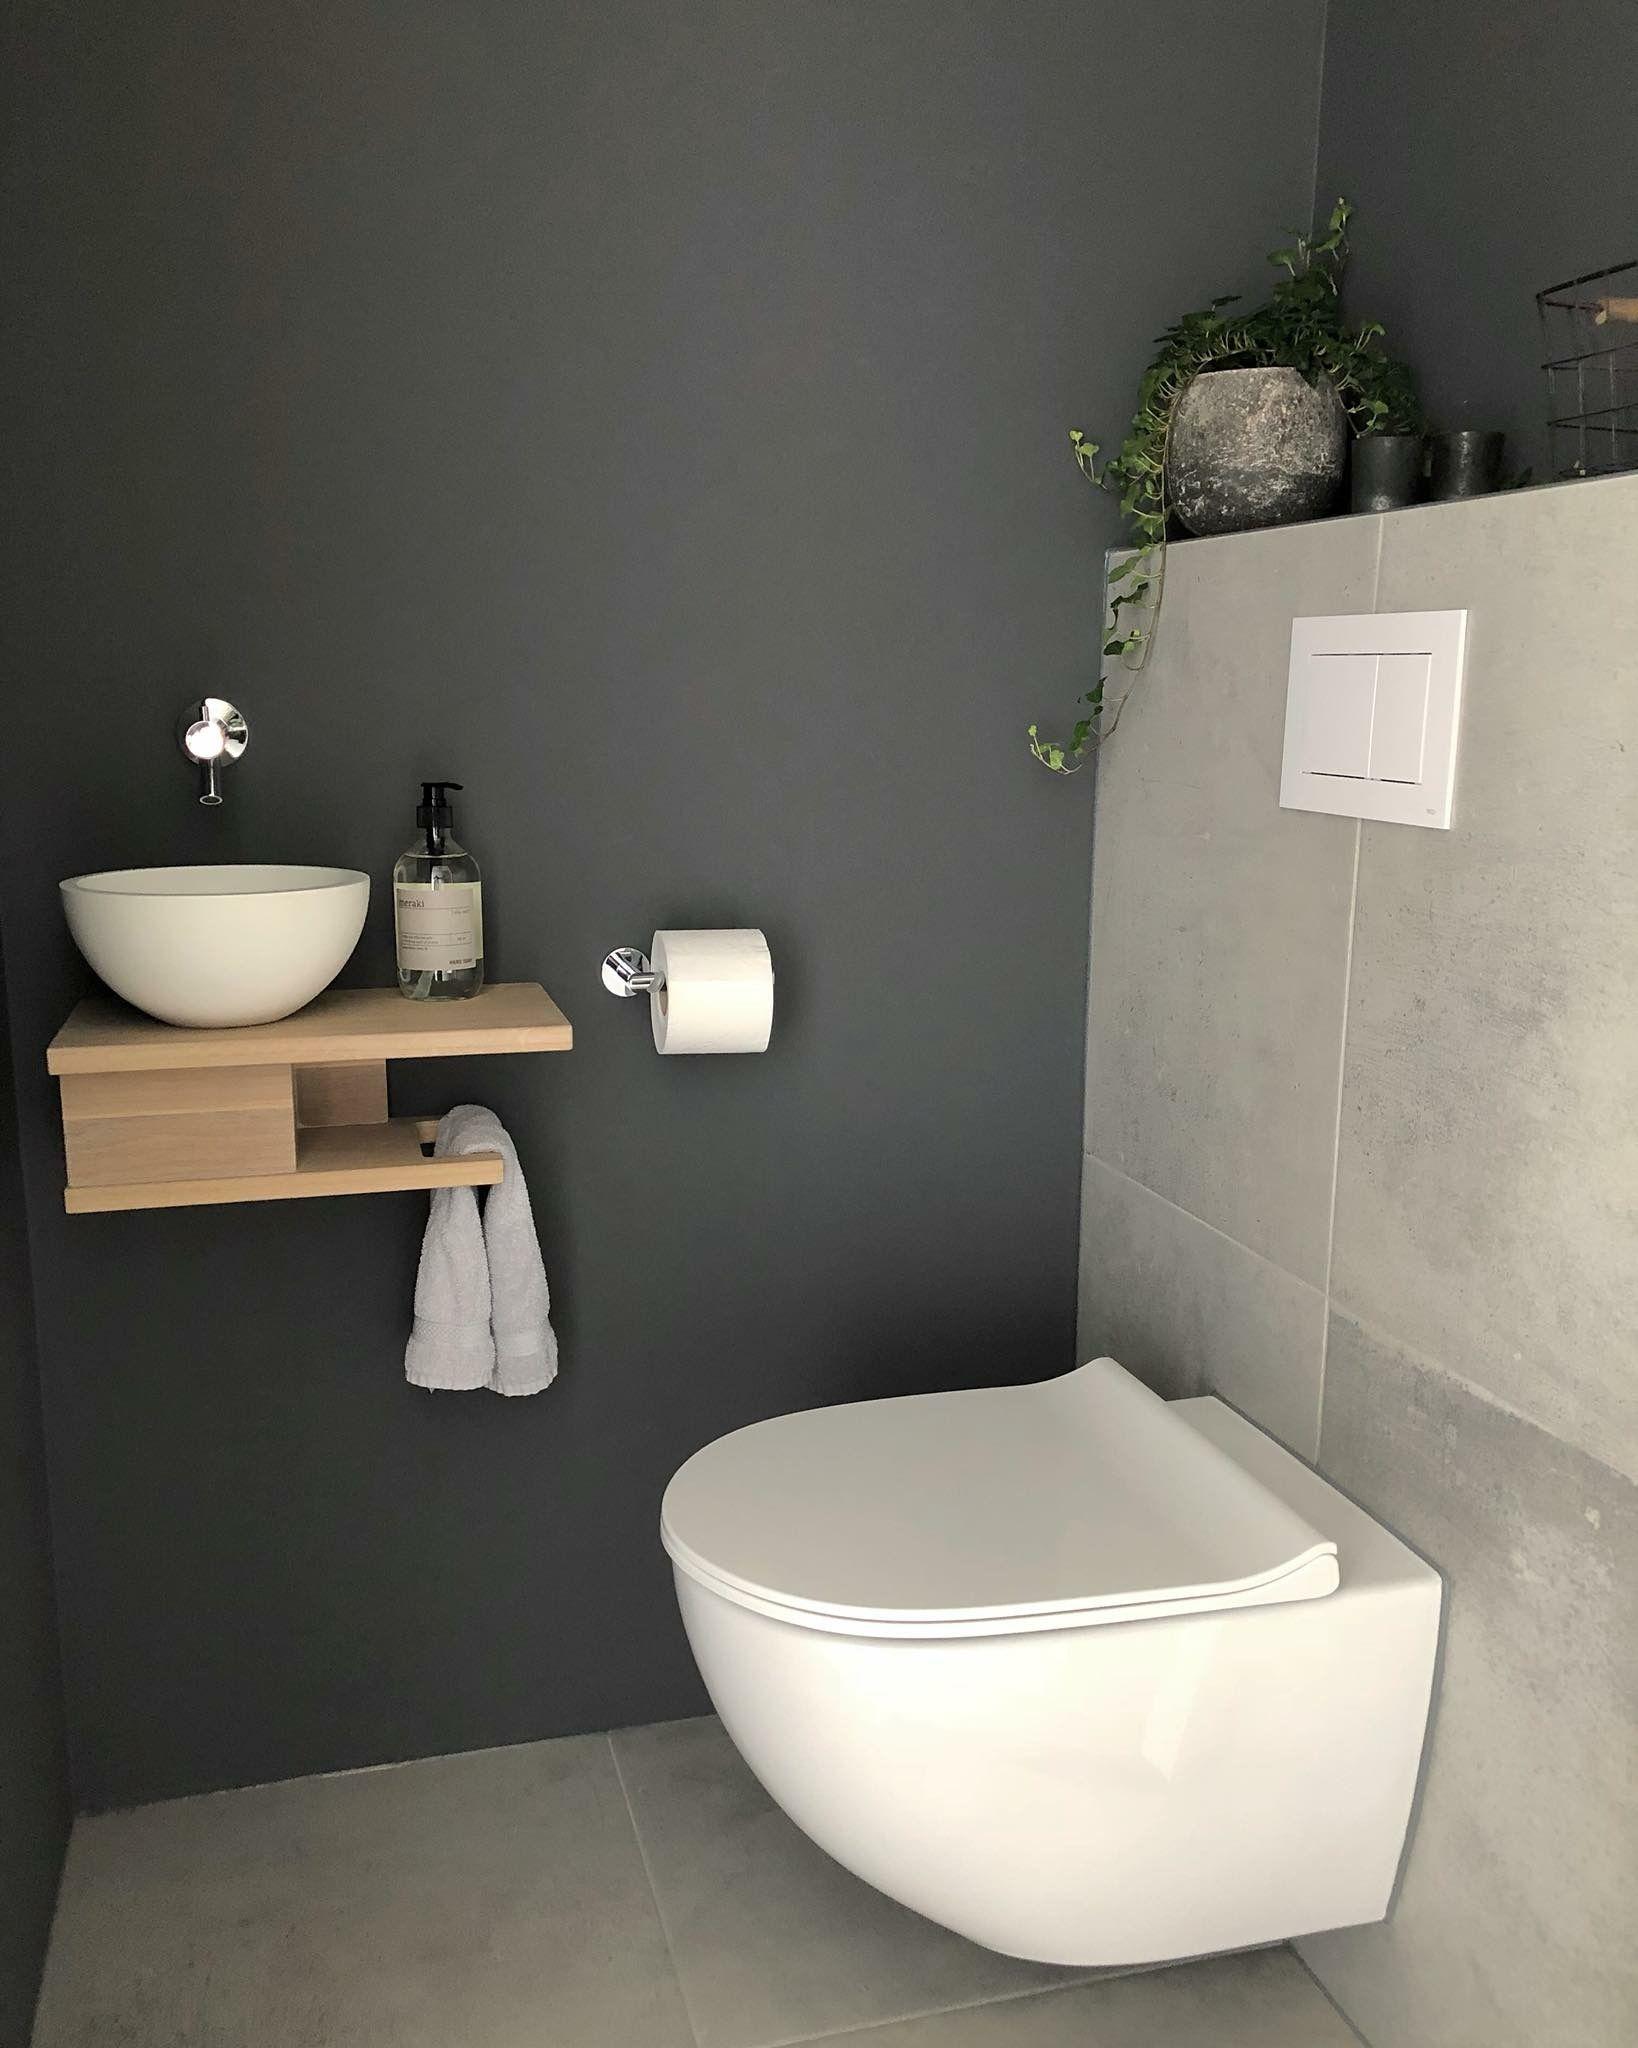 Bad eitelkeit design toilet  rooms  bathroom  pinterest  toilet bathroom and powder